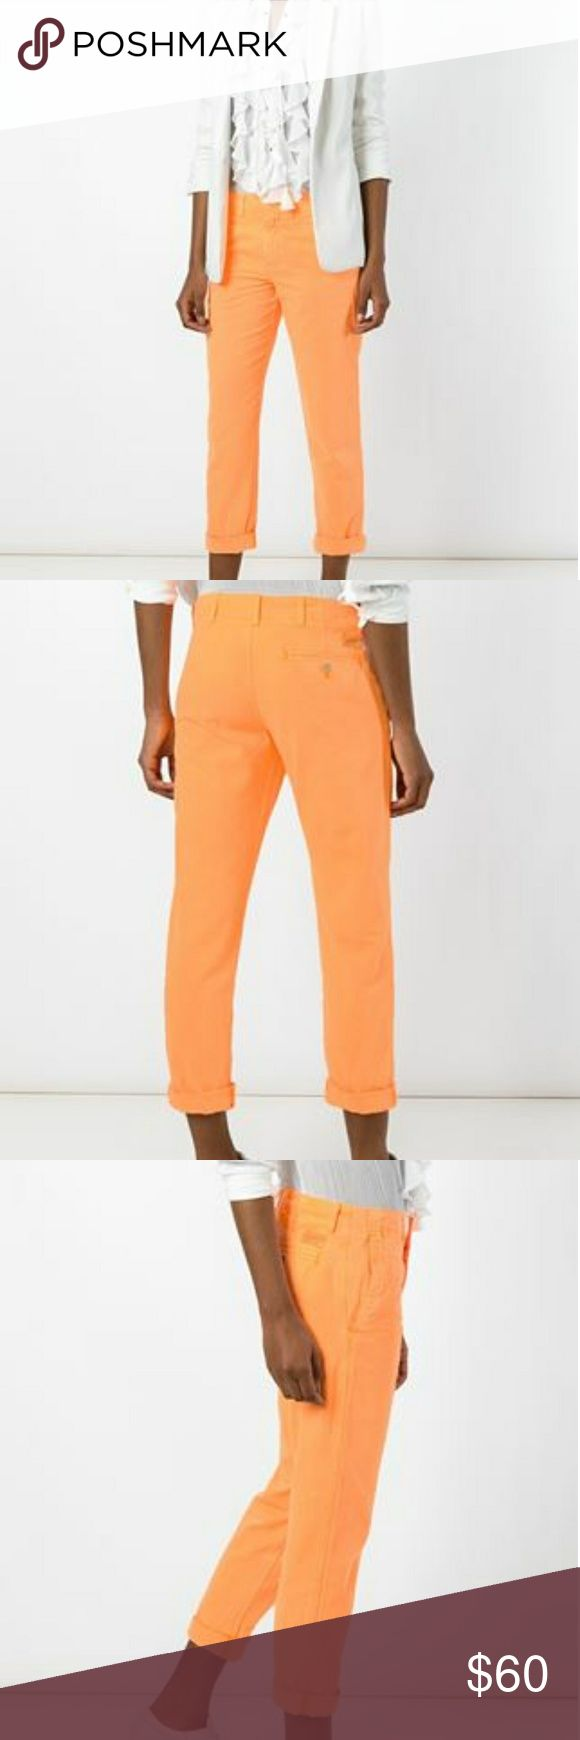 Polo Ralph Lauren Quinn Boyfriend Chinos Excellent pre-owned condition.  Washed orange cotton 'Quin' boyfriend jeans from Polo Ralph Lauren. Polo by Ralph Lauren Pants Trousers